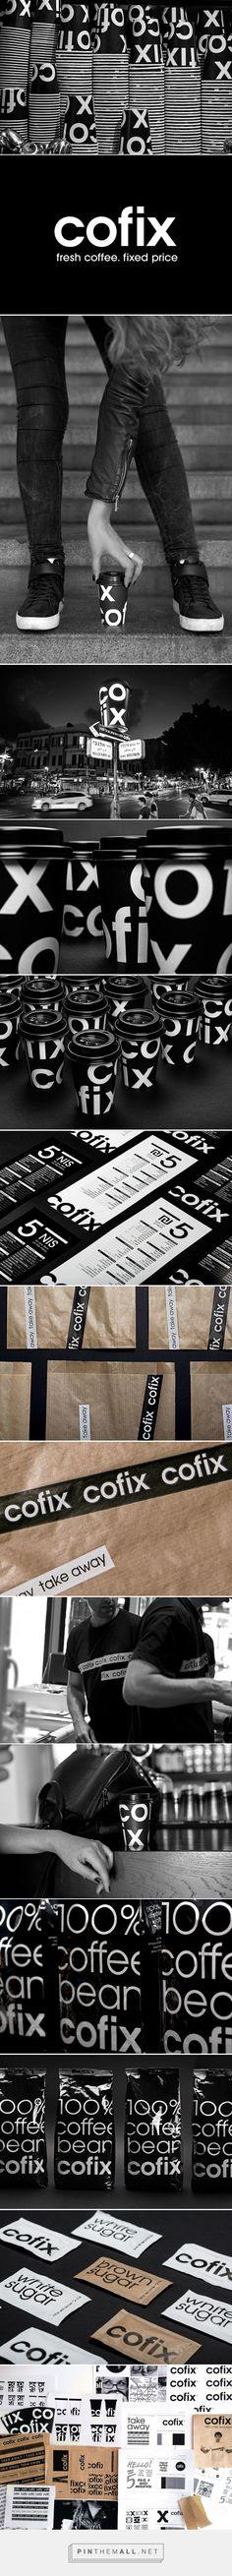 COFIX Coffee Shop Branding by Kapsoola | Fivestar Branding Agency – Design and Branding Agency & Curated Inspiration Gallery